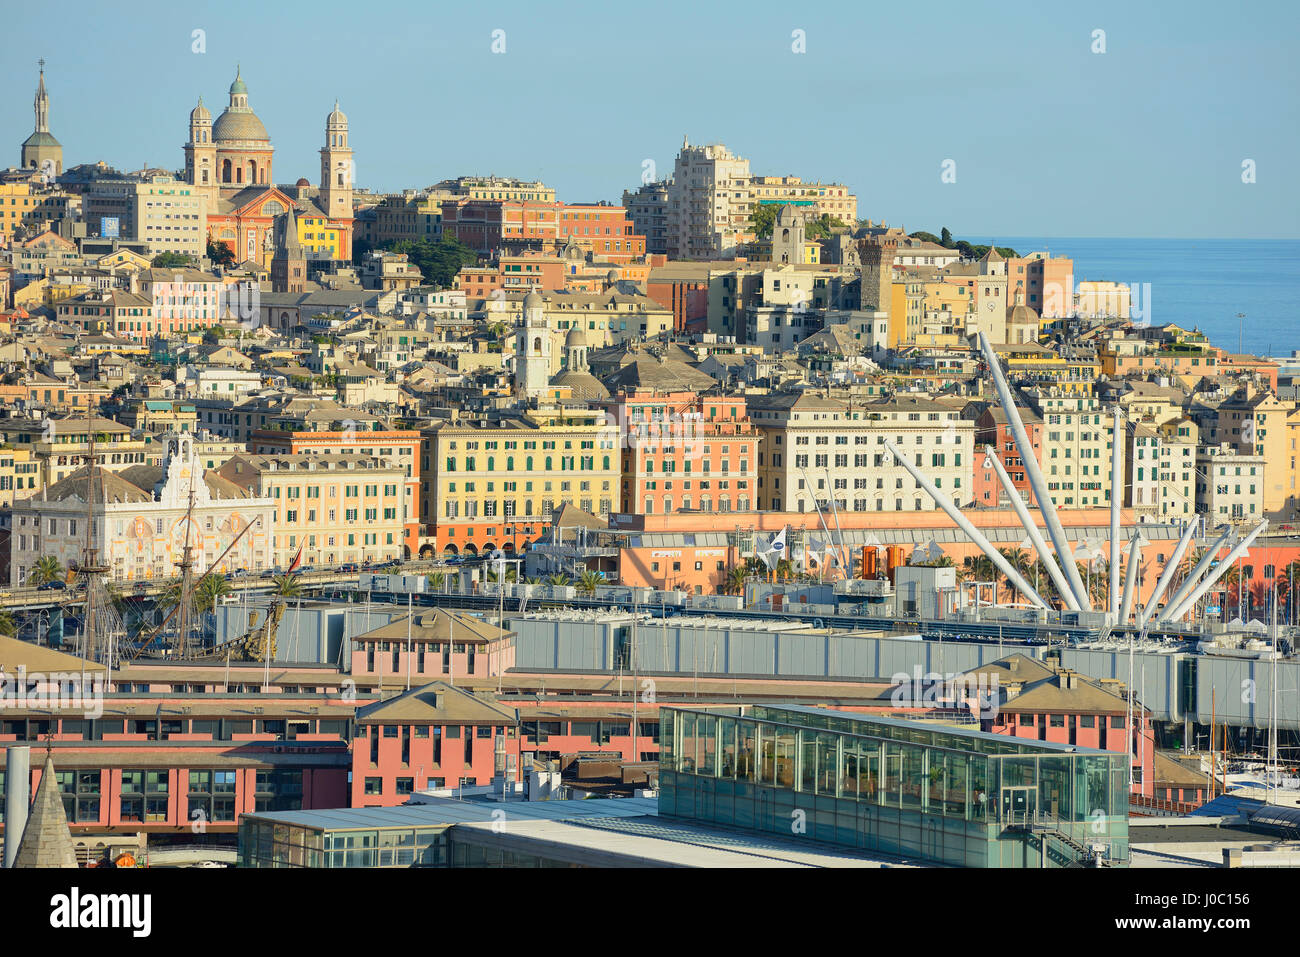 Cityscape, Genoa, Liguria, Italy - Stock Image